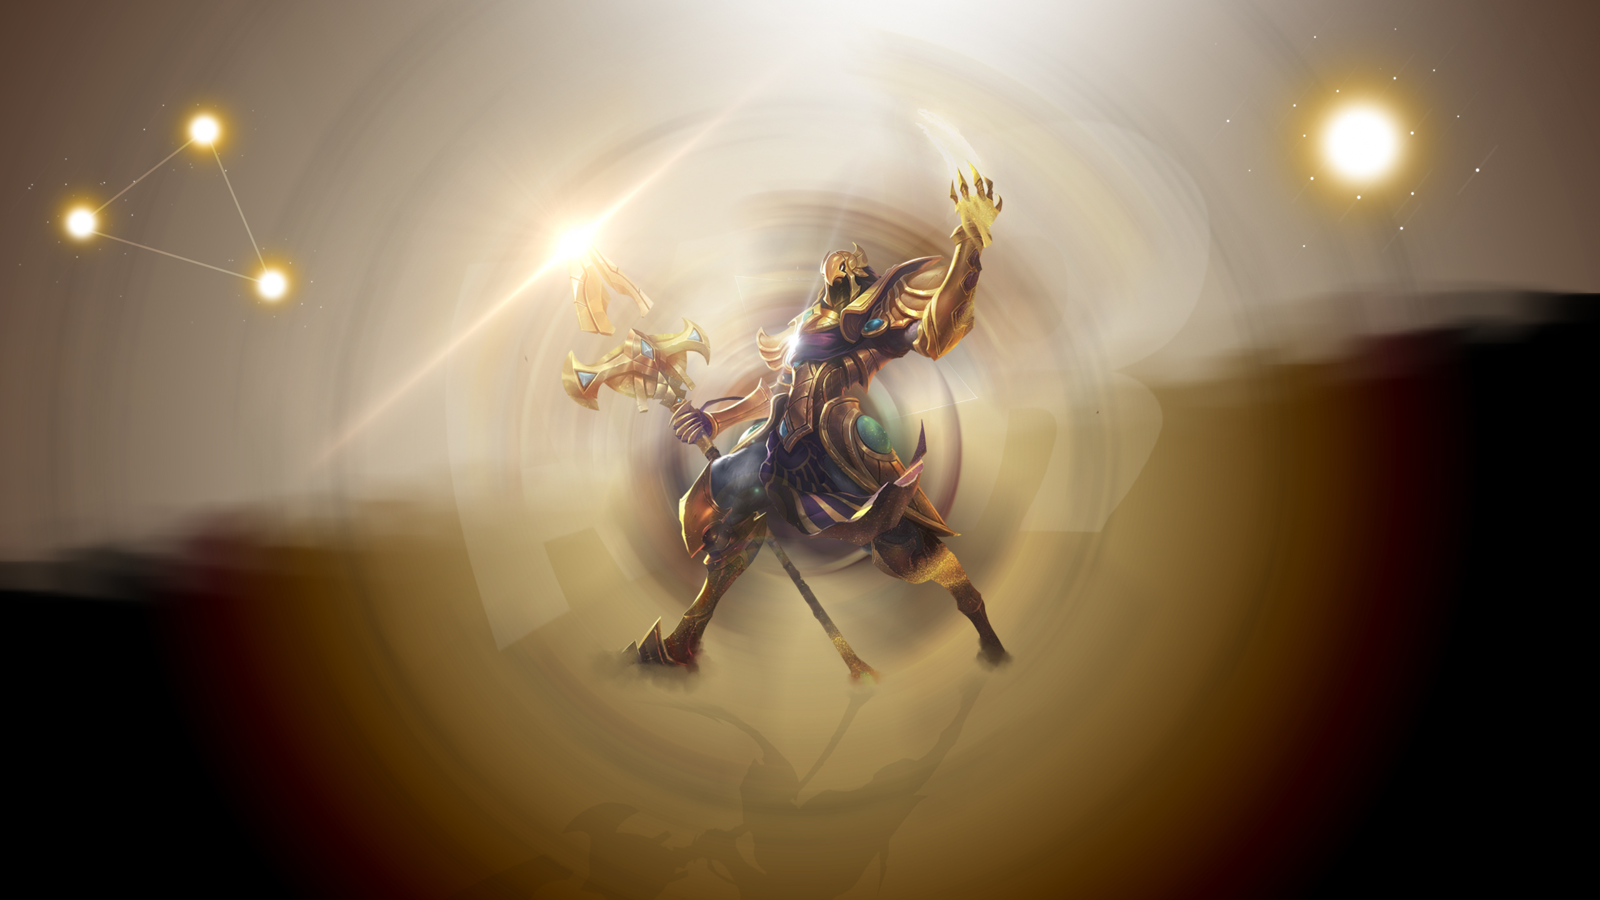 Azir League Of Legends Wallpapers Hd 2560 215 1440 League Of